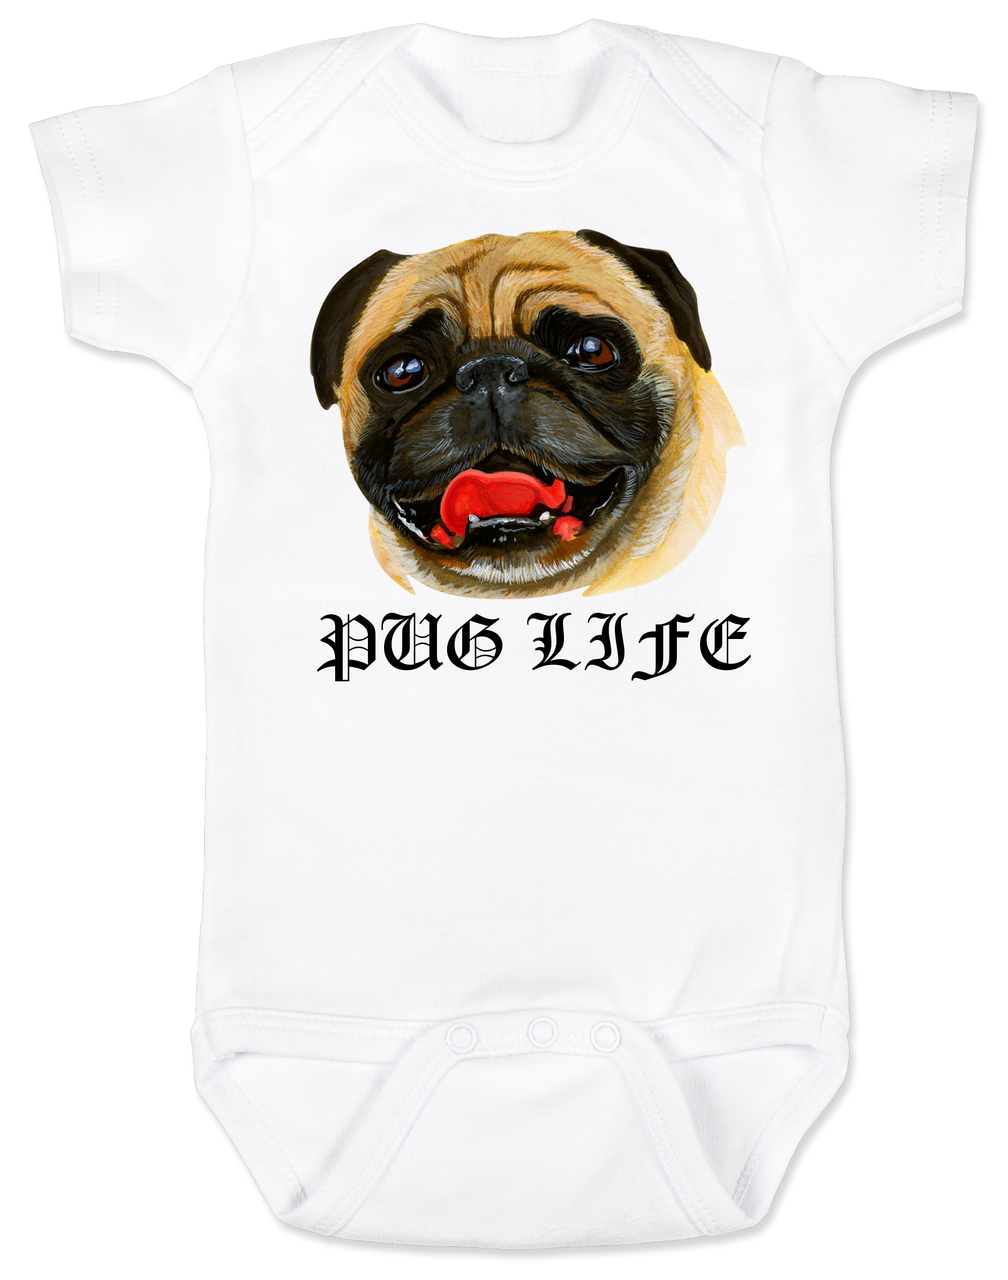 c1fc1186a Pug Life baby Bodysuit Pug Love Bodysuit Pug Bodysuit personalized dog  lover Bodysuit unique baby shower